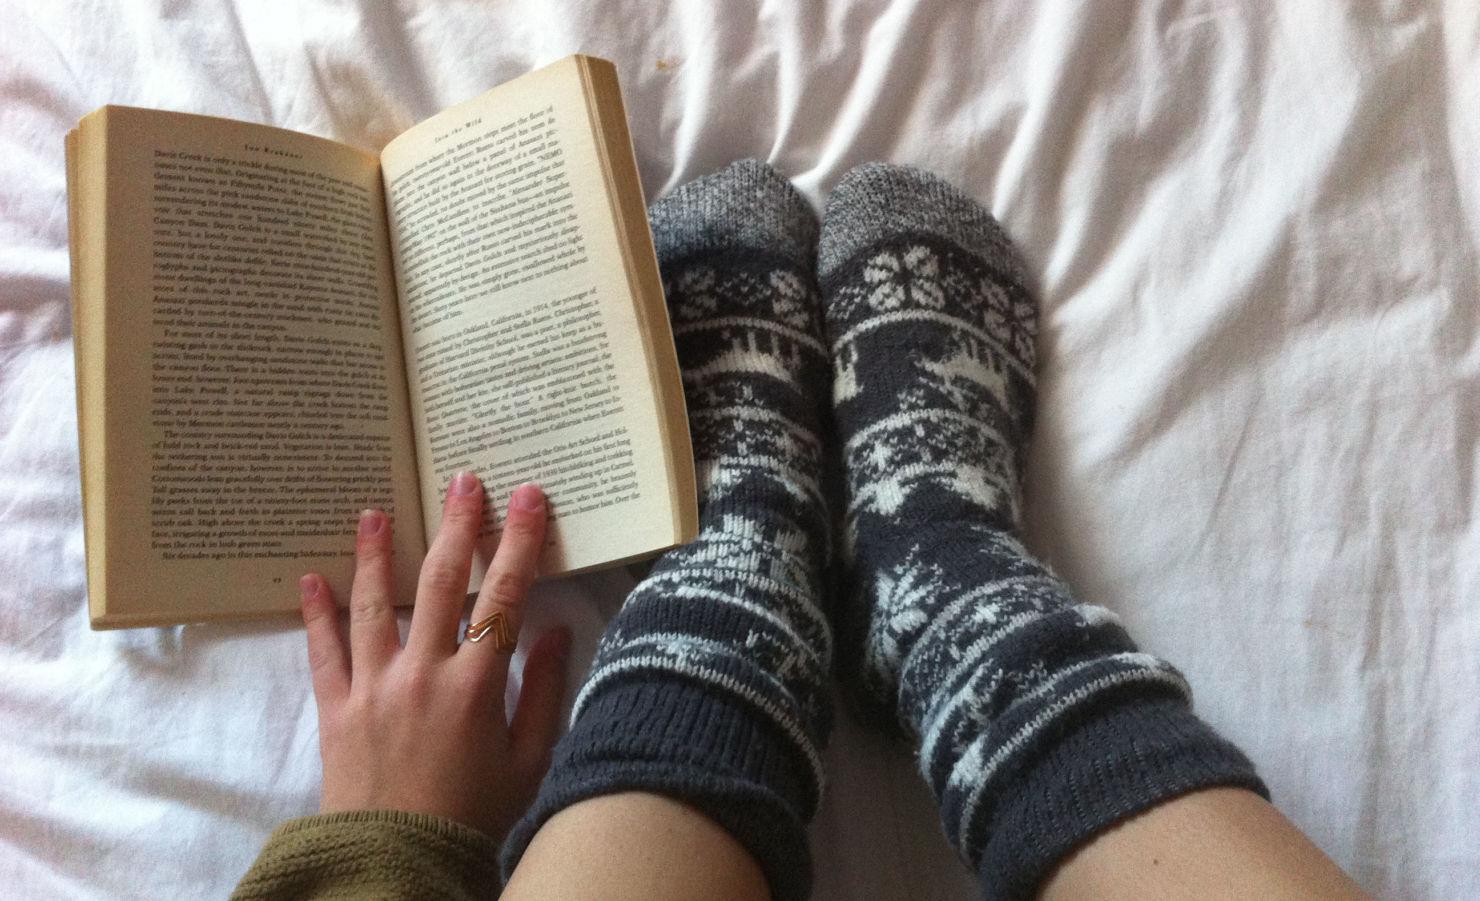 10 libros adictivos que te harán olvidarte de todo lo que está pasando